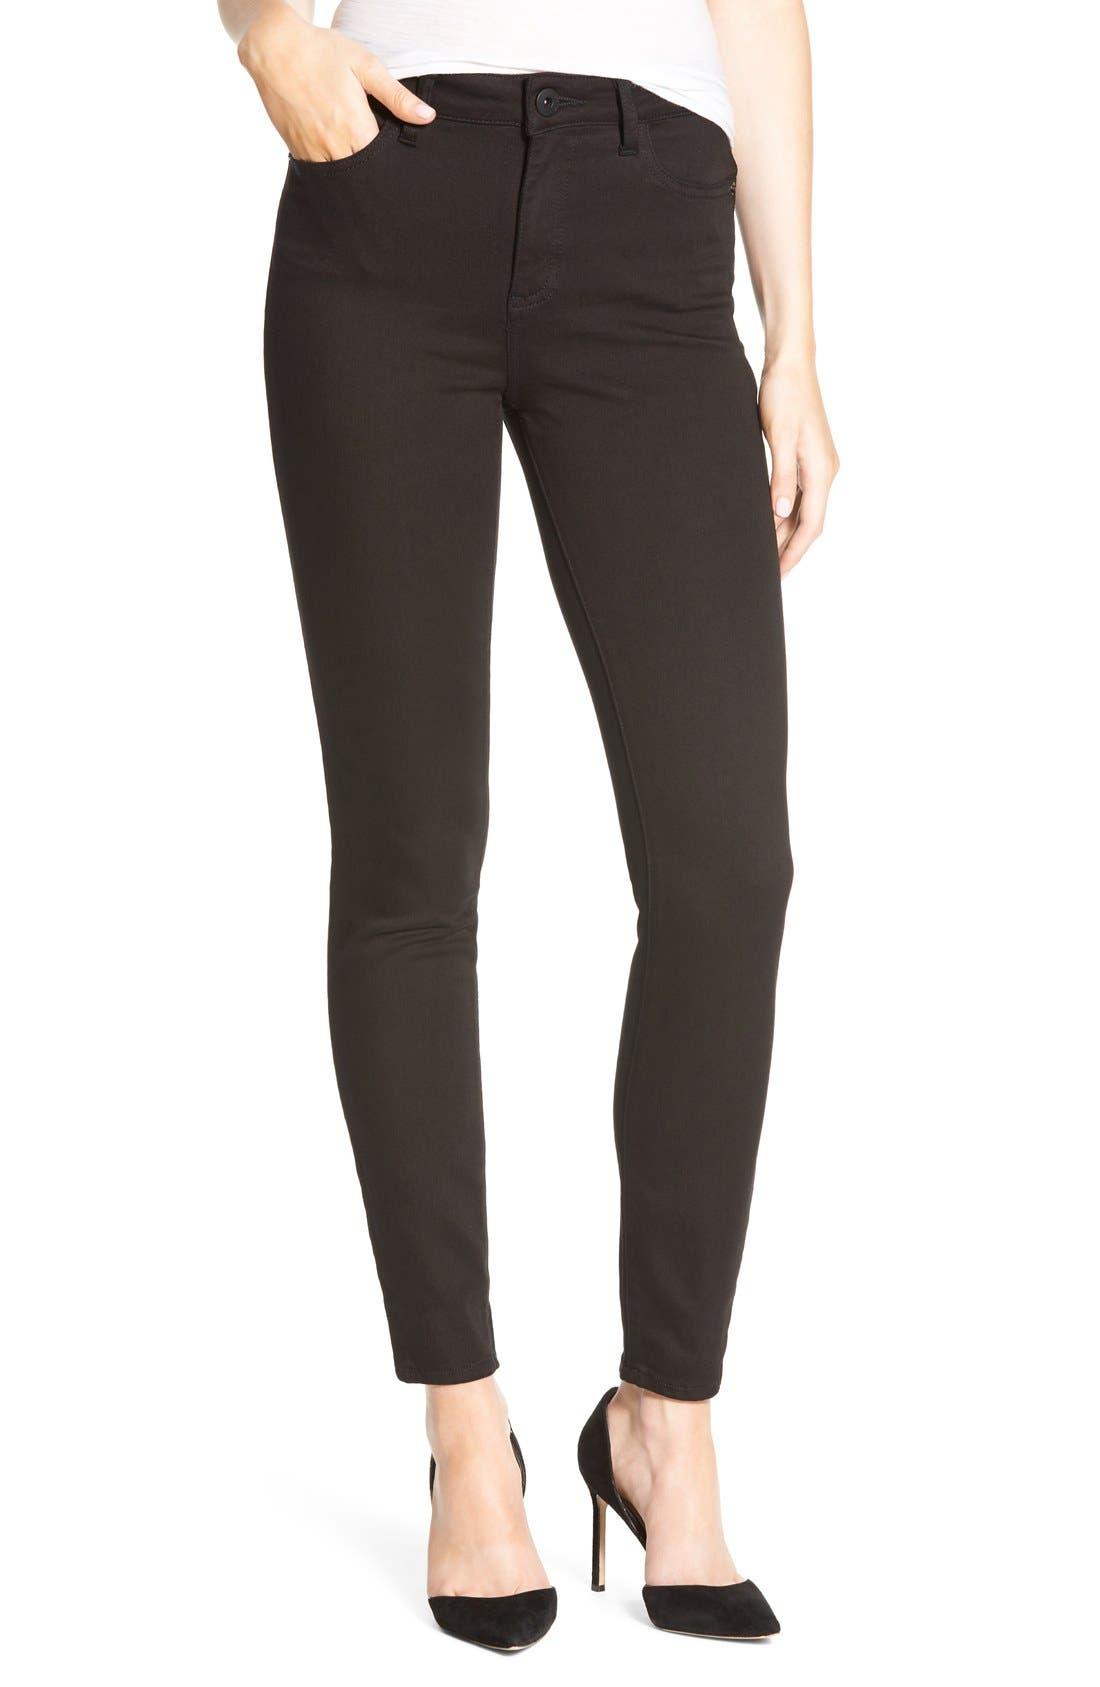 DL1961 Farrow Instaslim High-Rise Skinny Ankle Jeans, Hail in Black